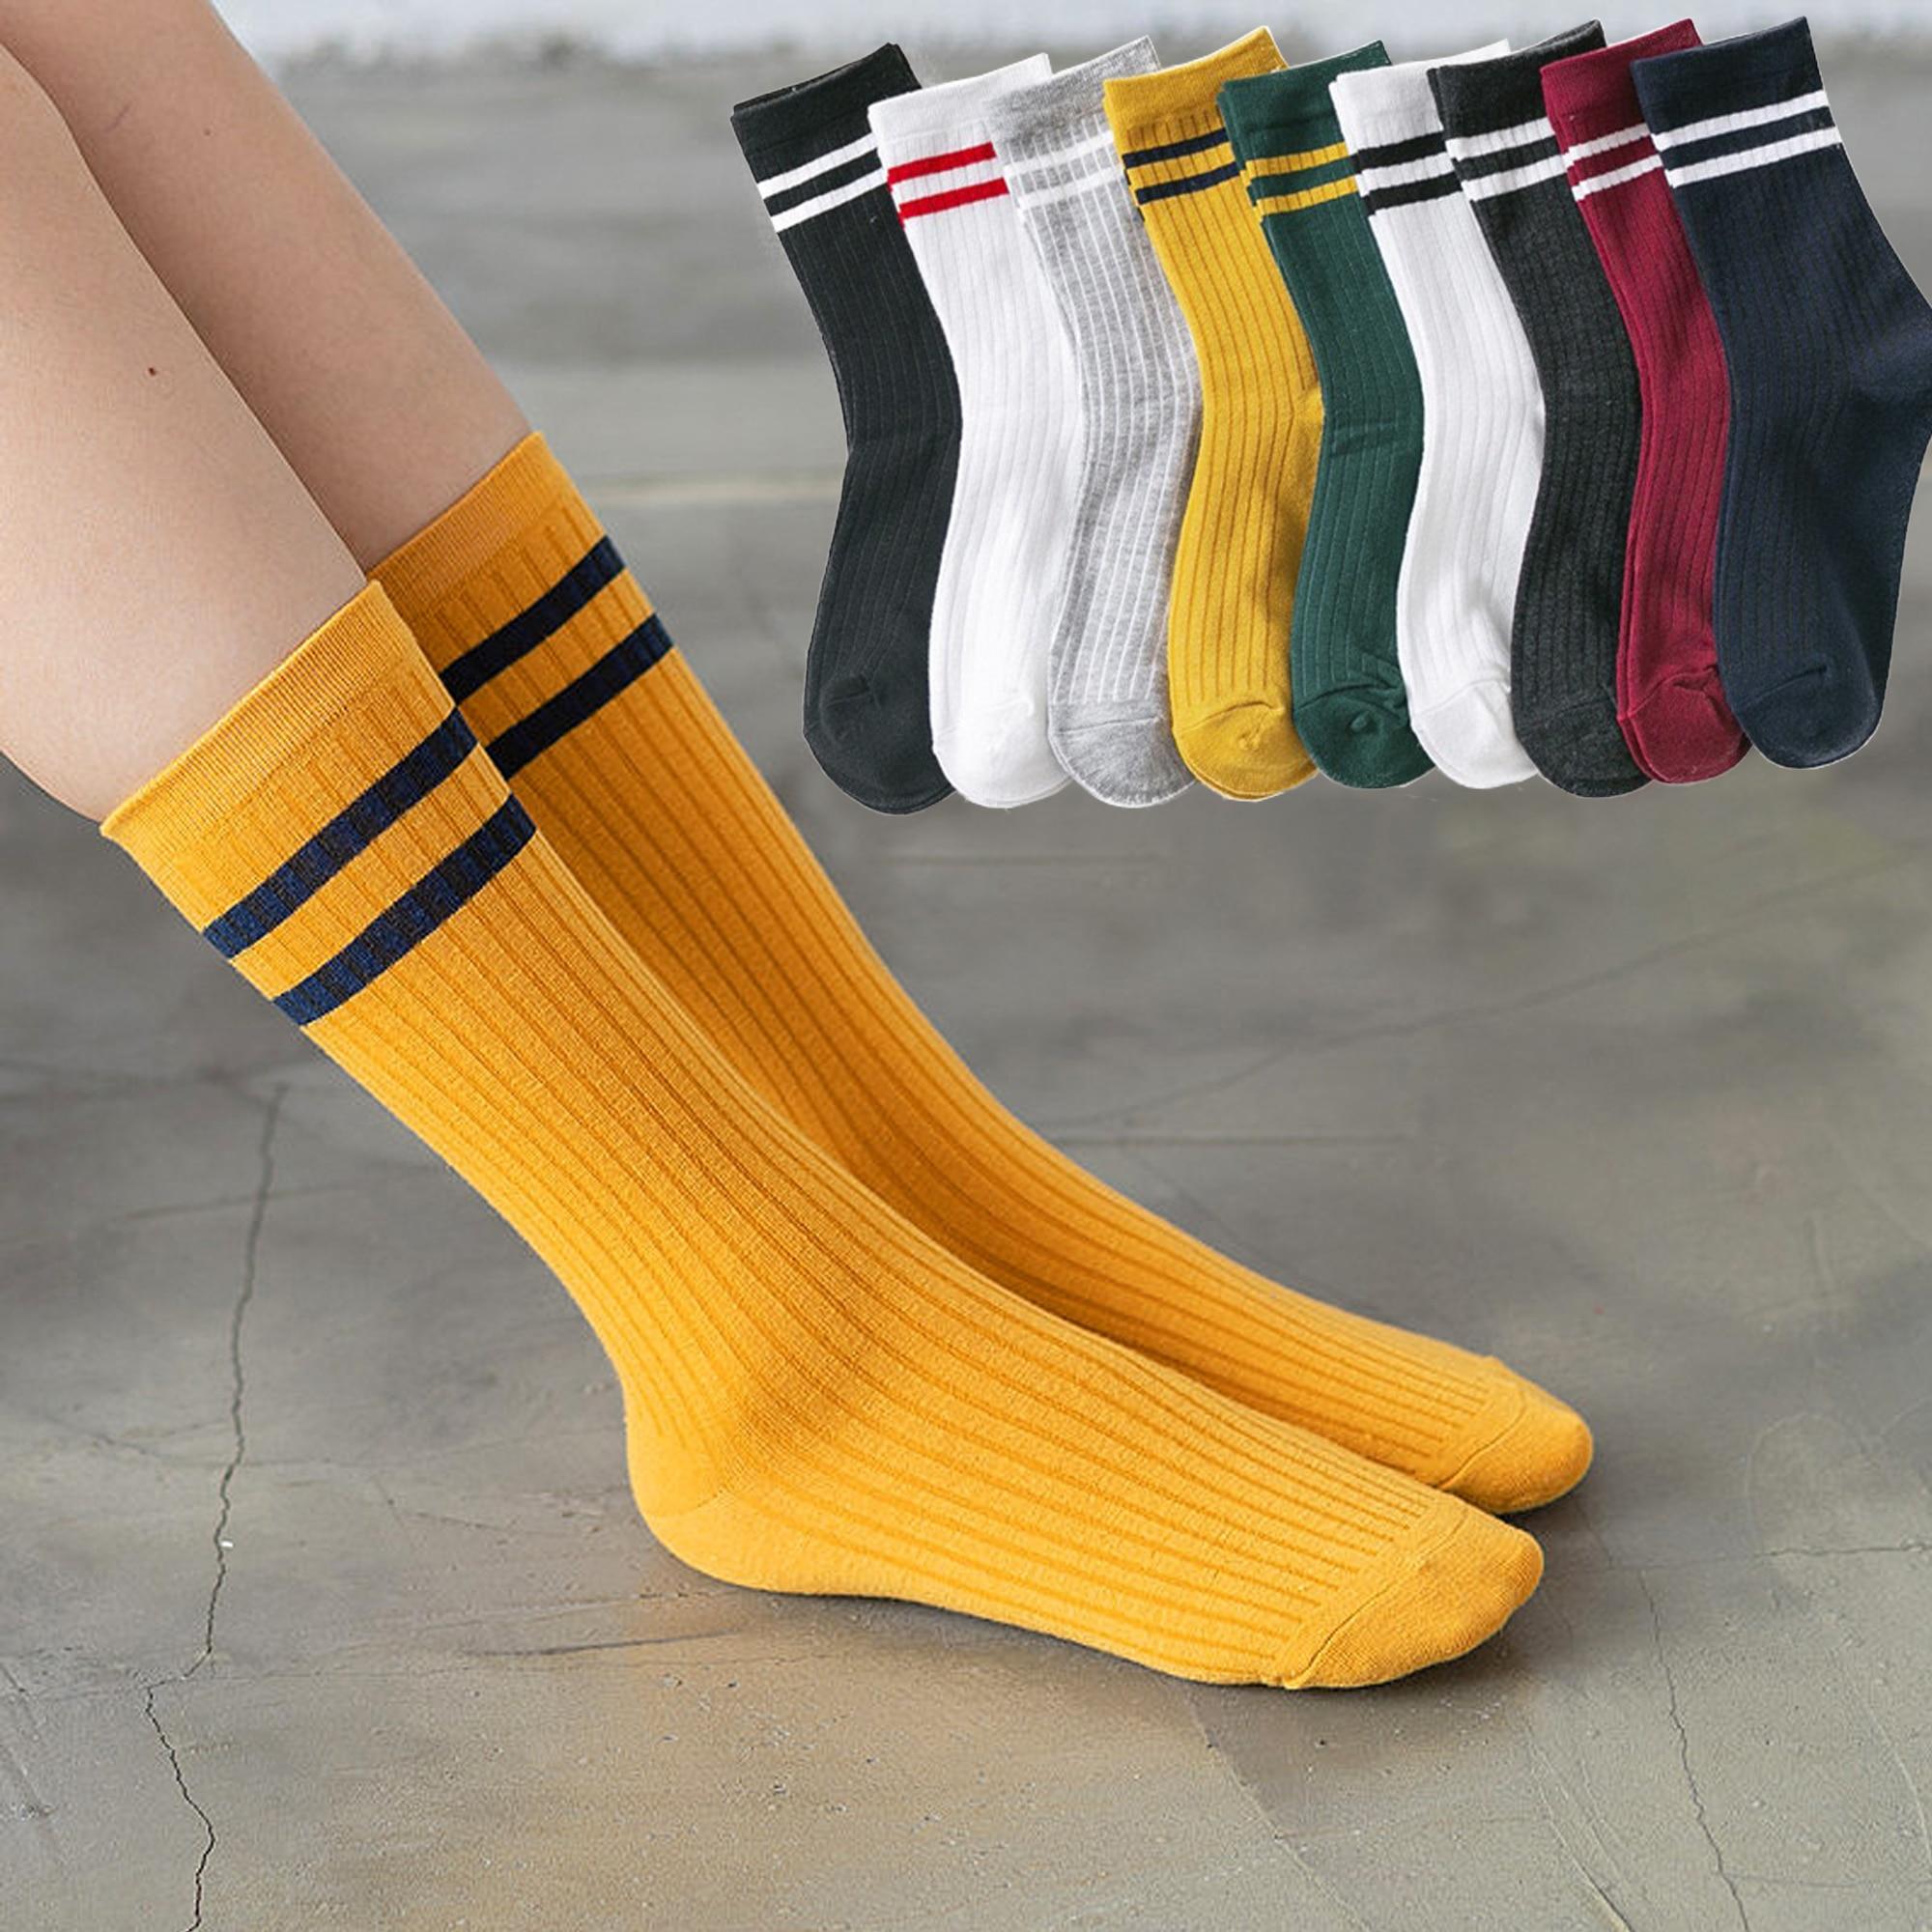 New Japanese Two Bars Cotton Socks Women Black white Yellow green Funny Harajuku Girls Cute Socks High Quality Fashion Socks